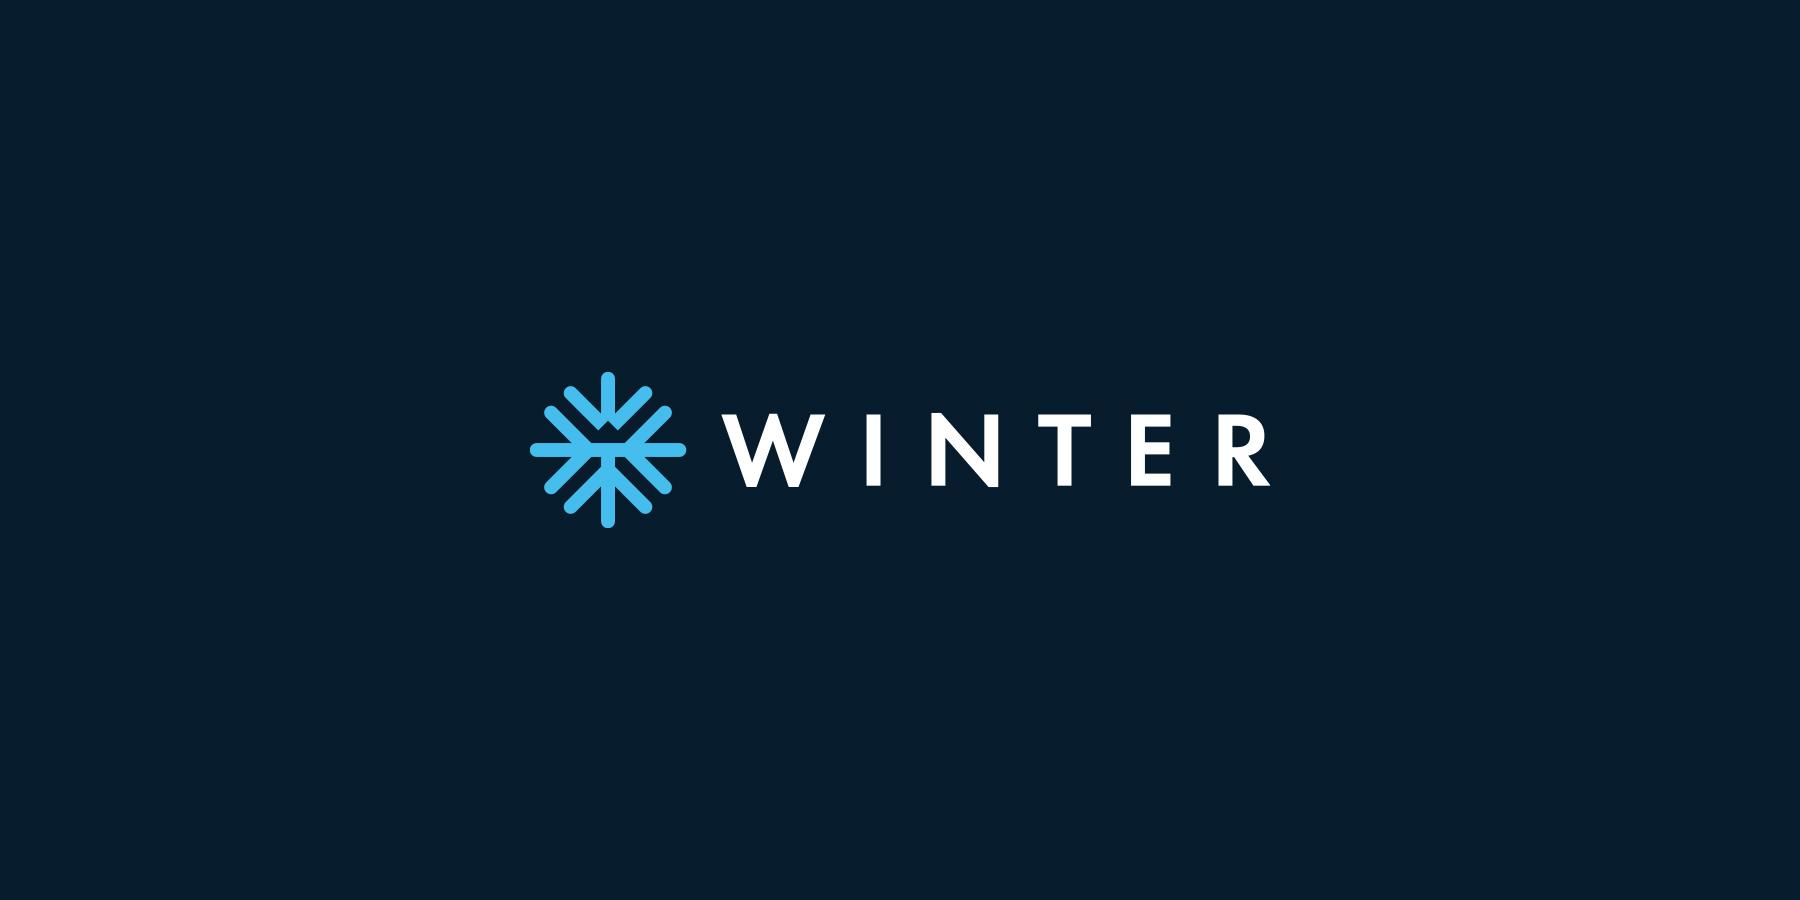 winter-logo-design-04